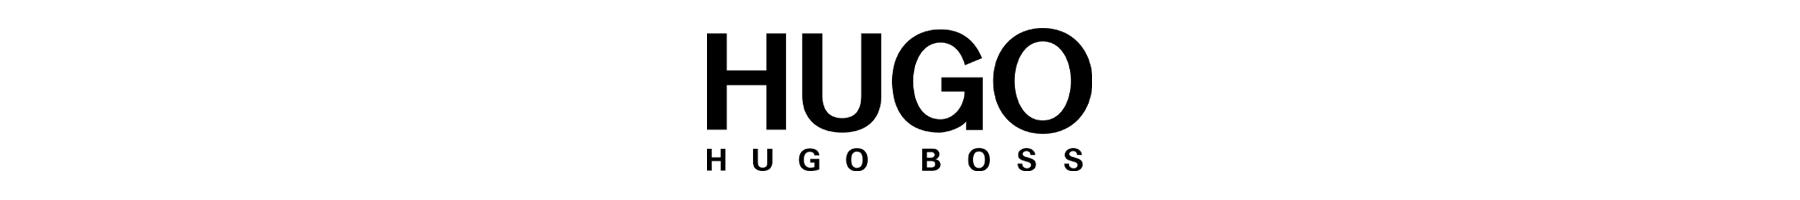 DrJays.com - Hugo Boss